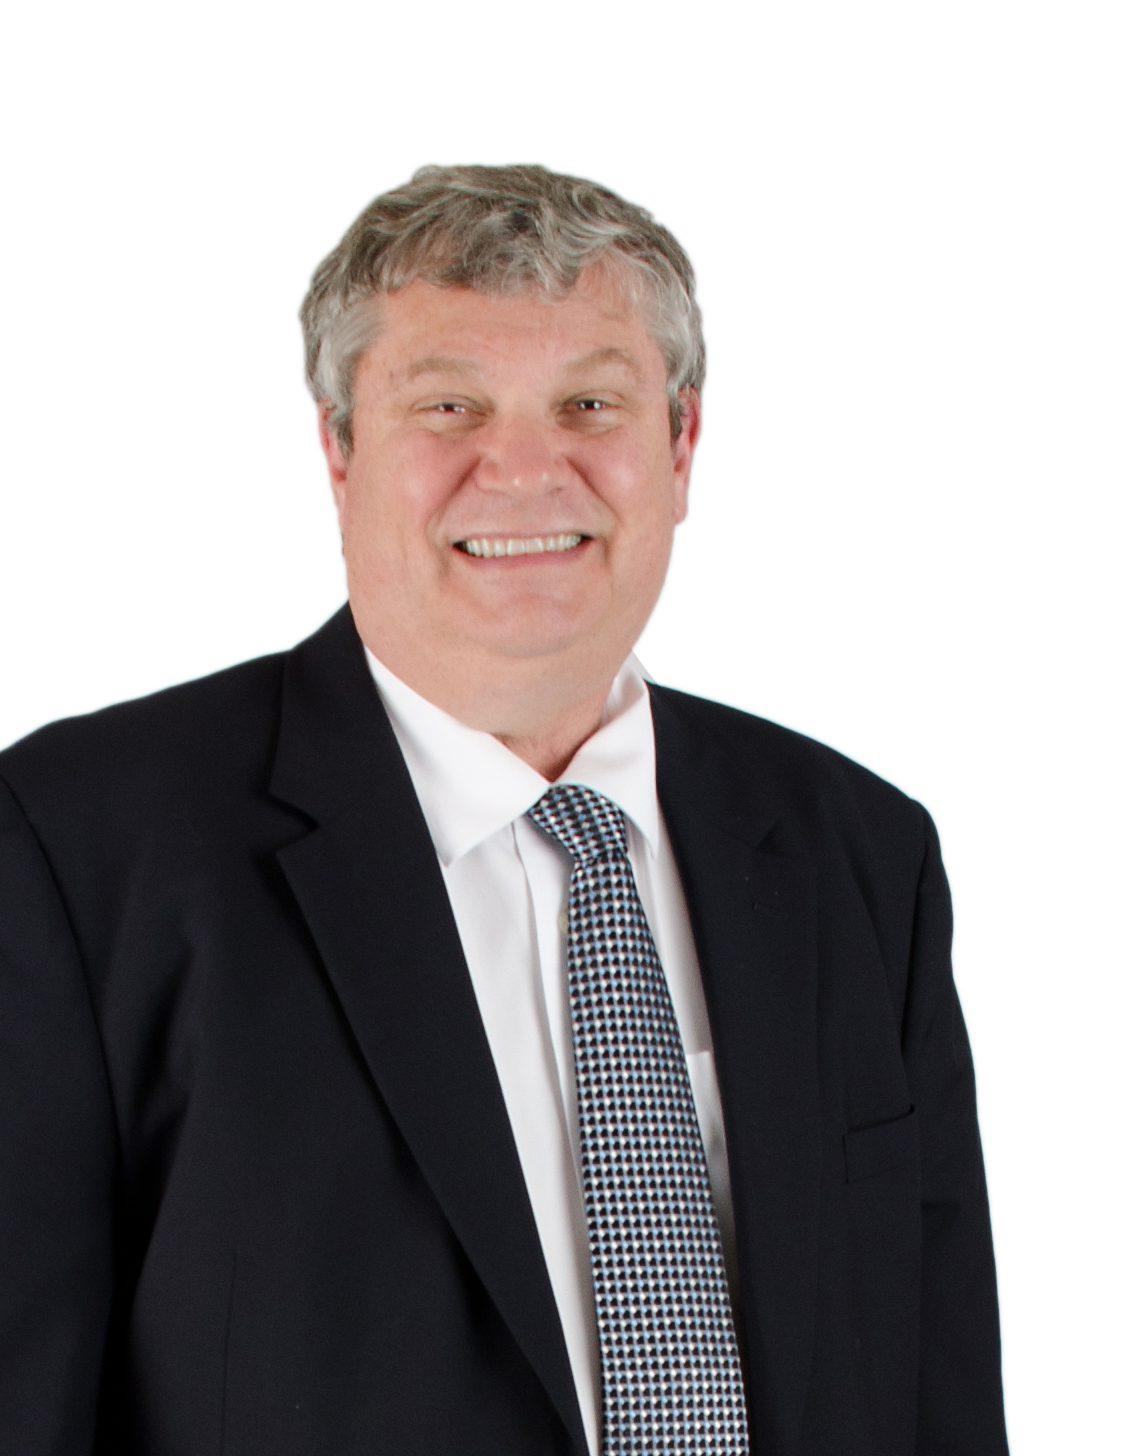 profile photograph of randall baxter